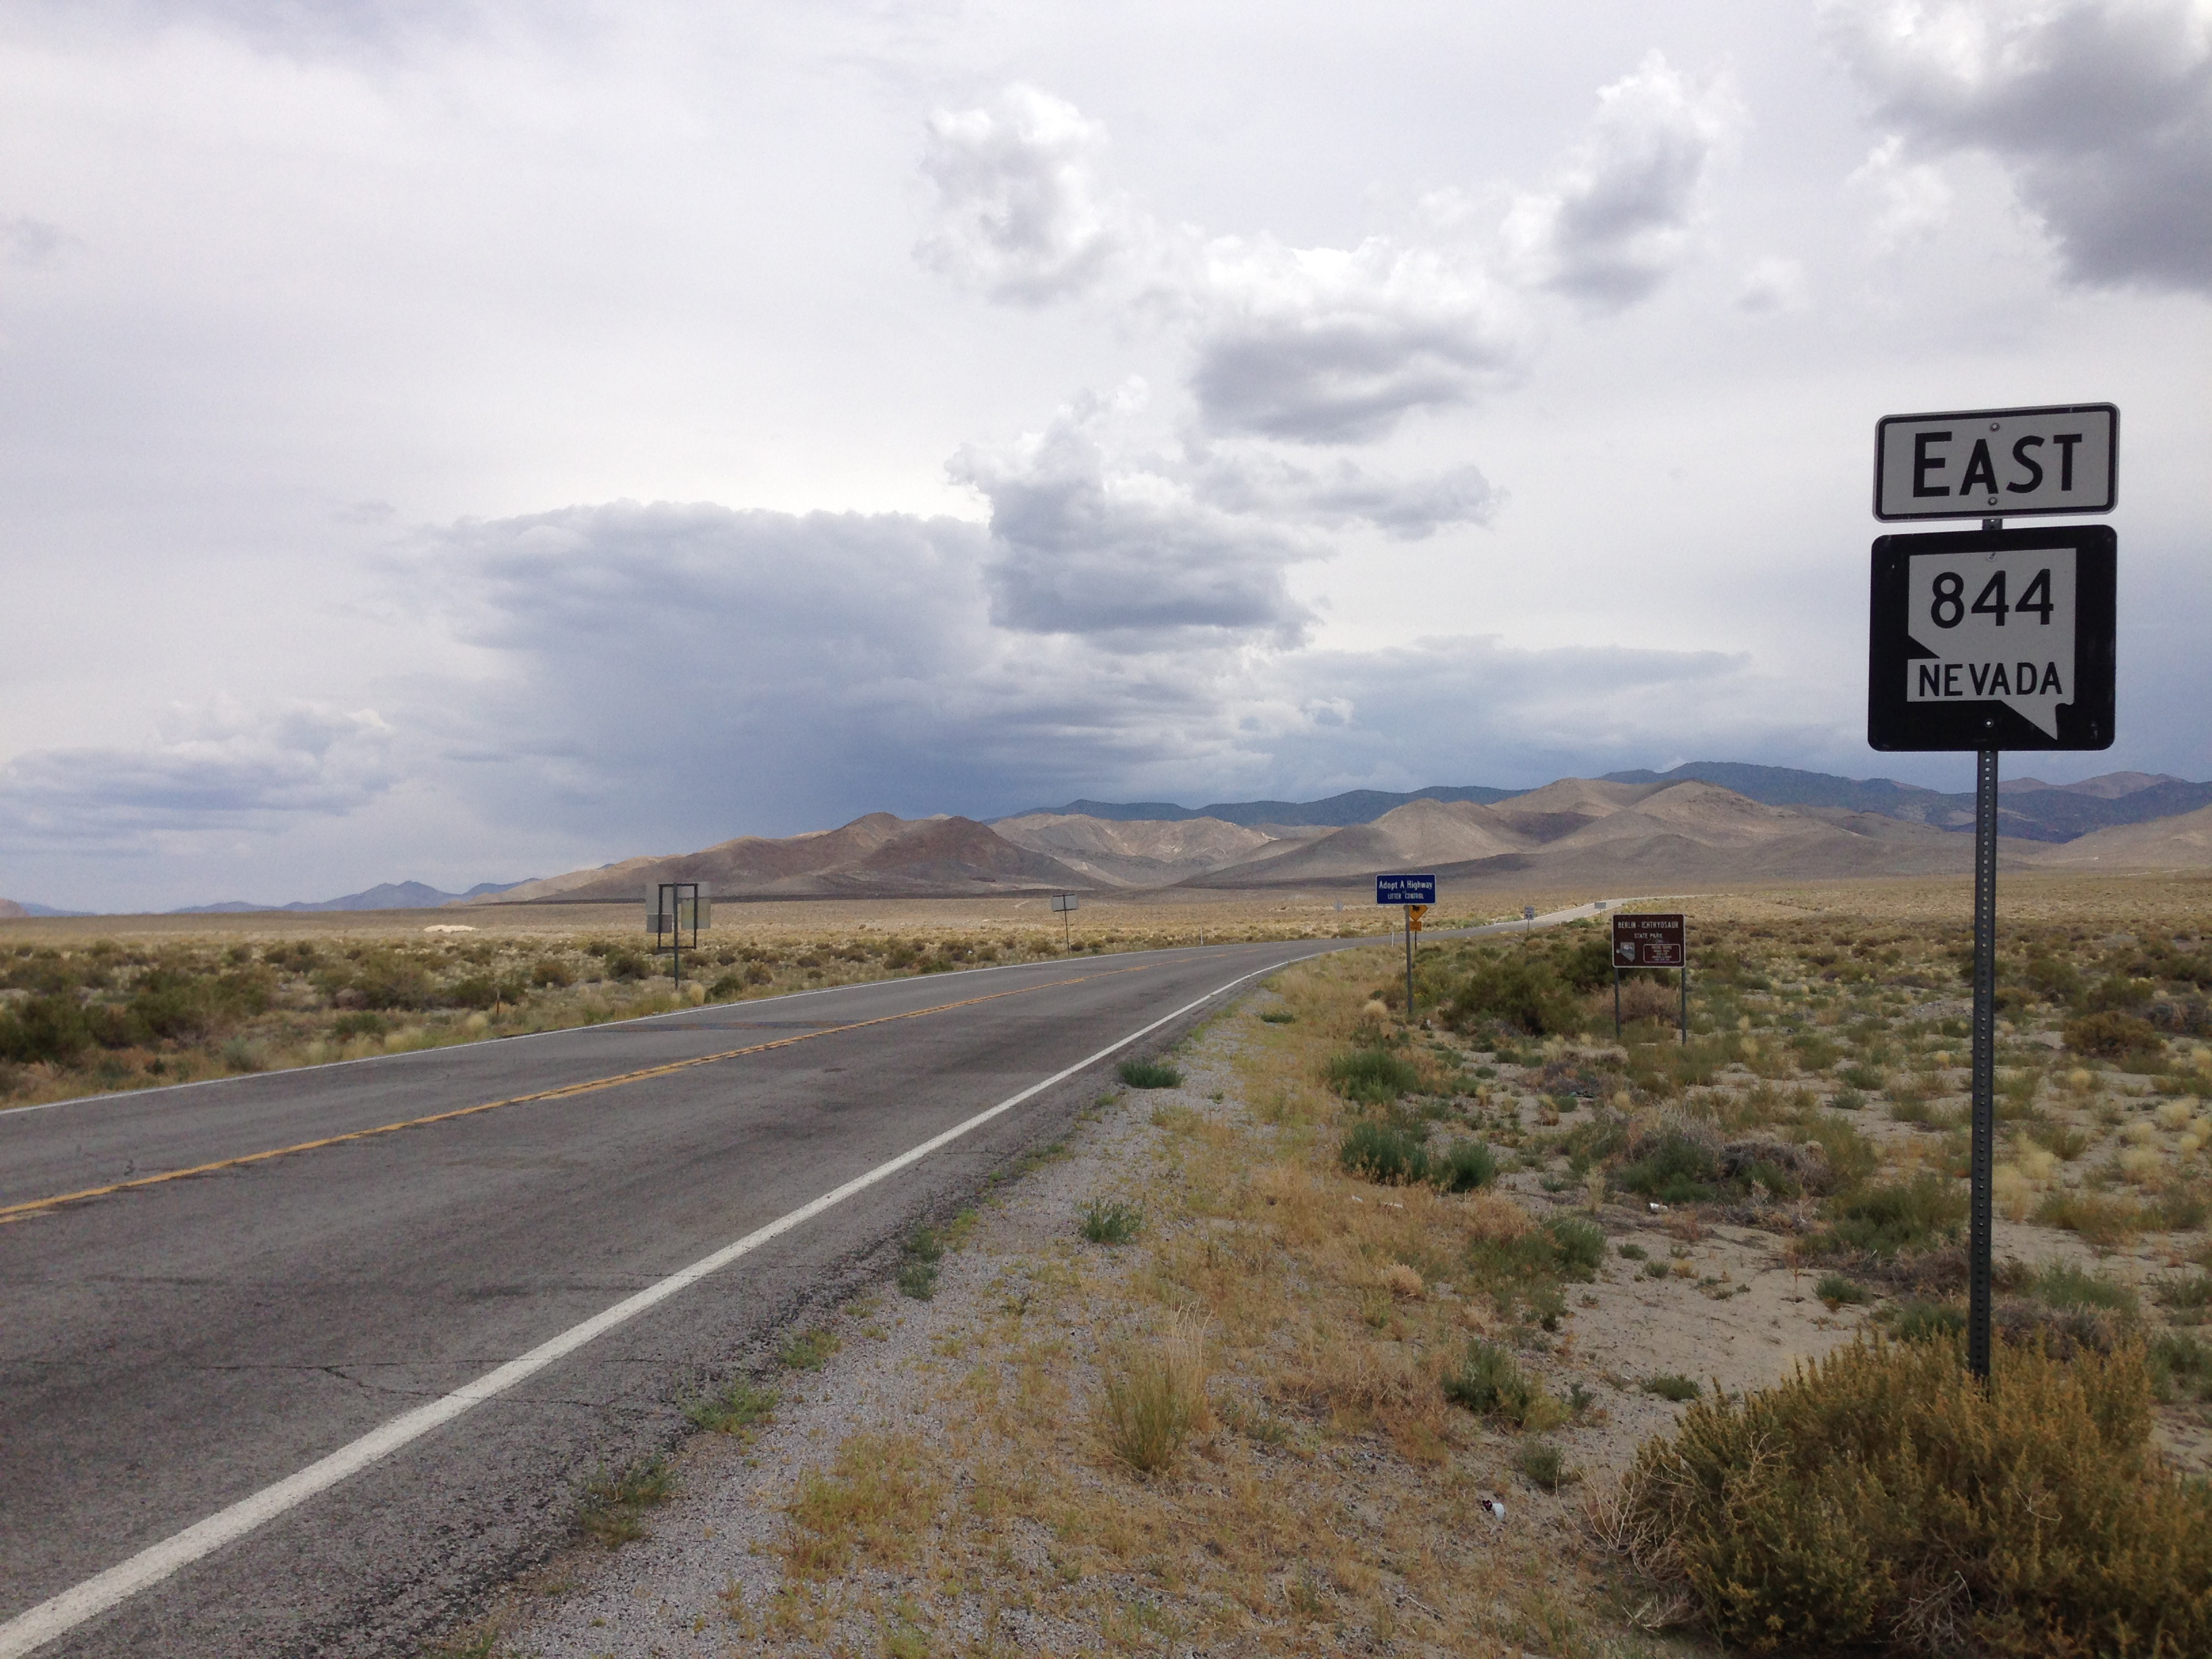 Nevada State Route 844 Quiz